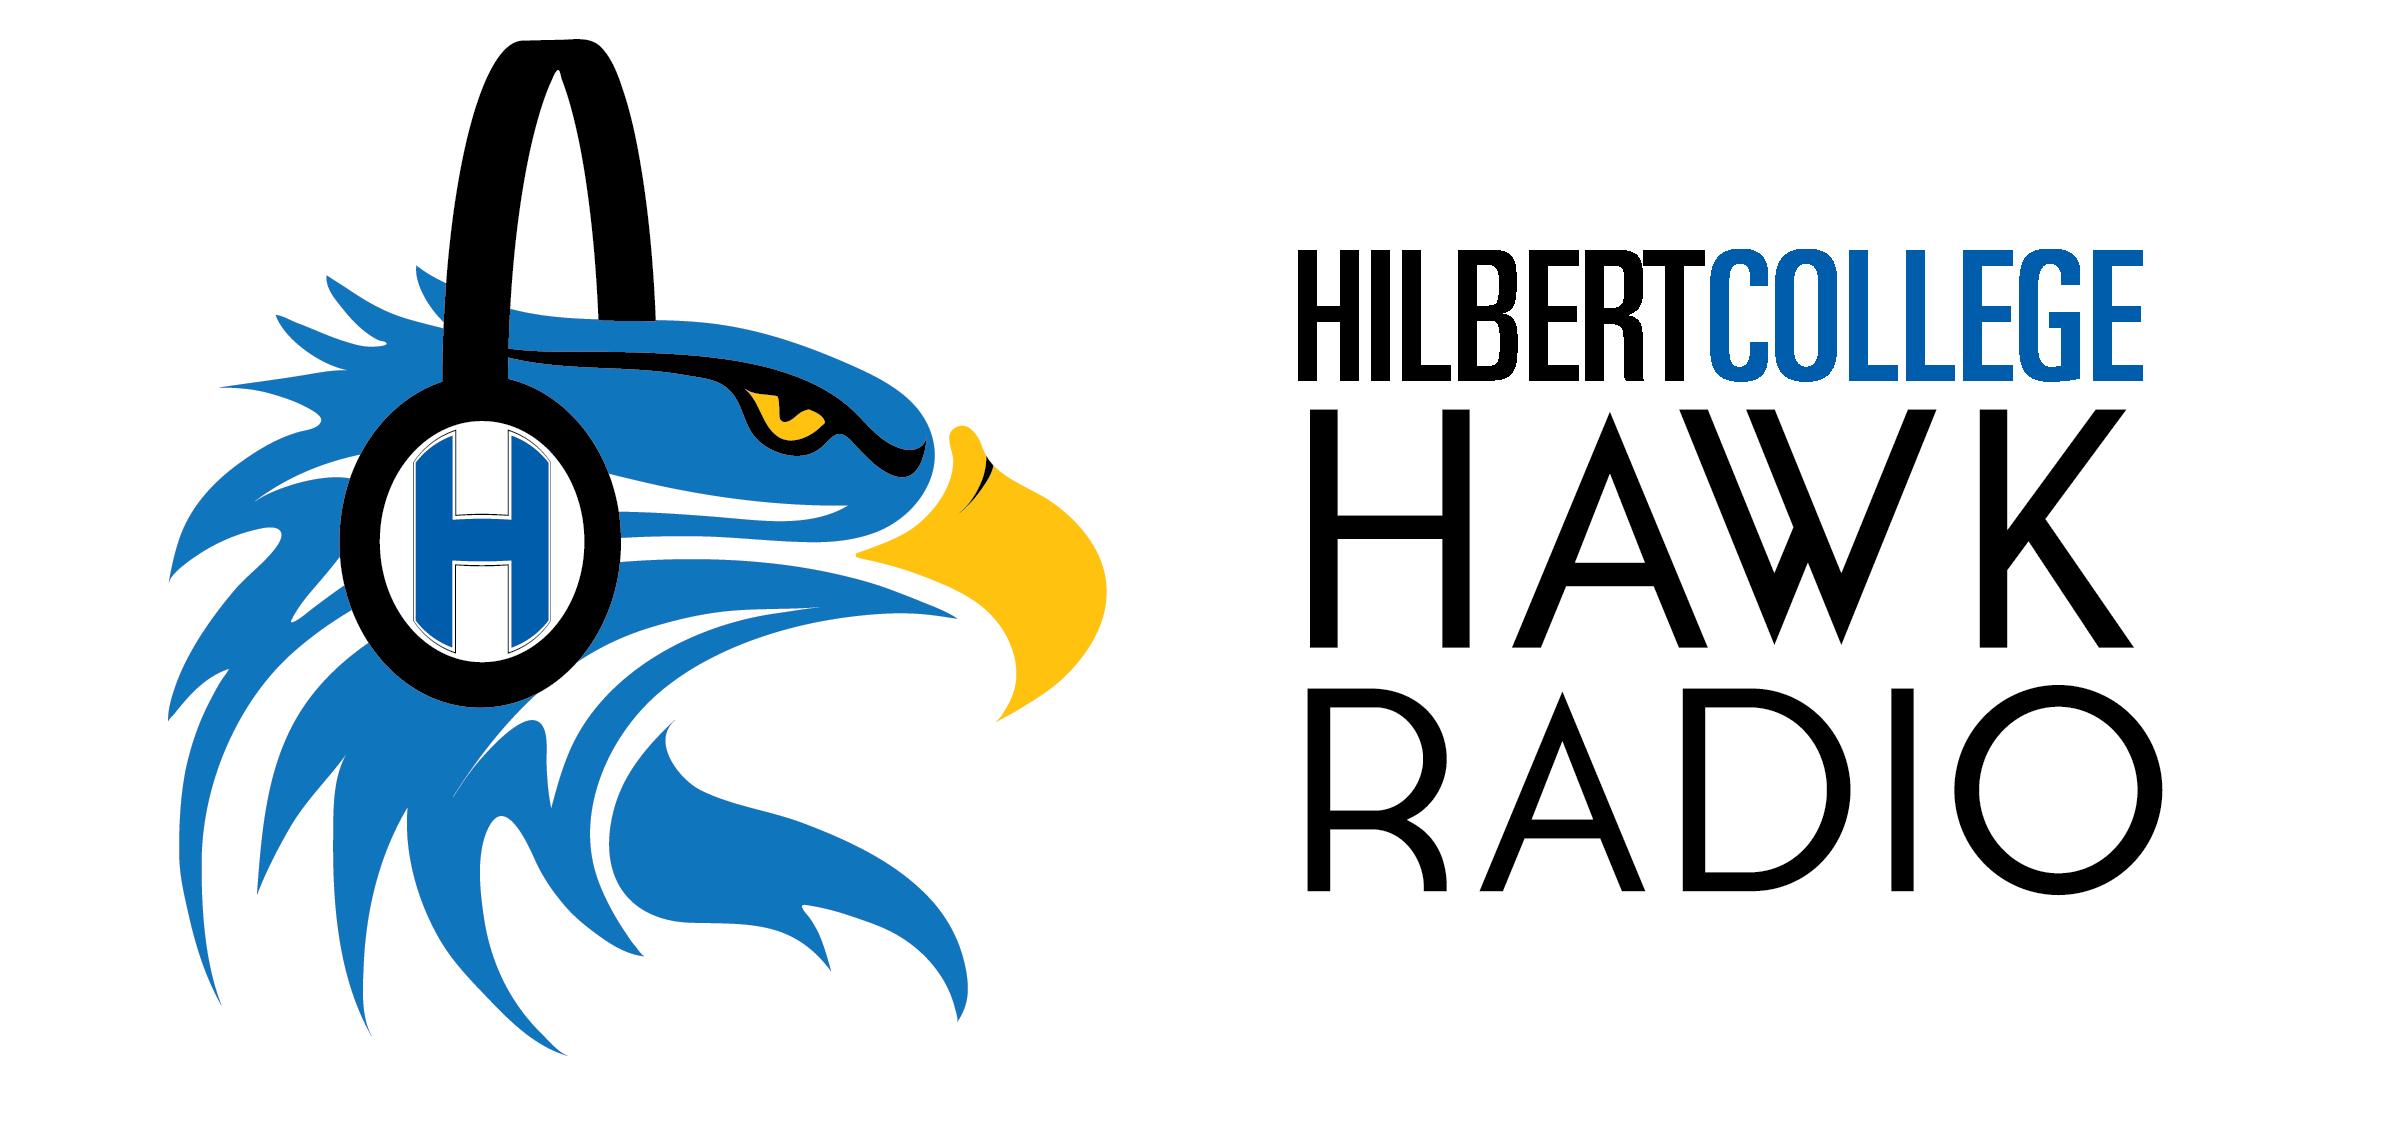 HAWK-Radio-Hilbert-College